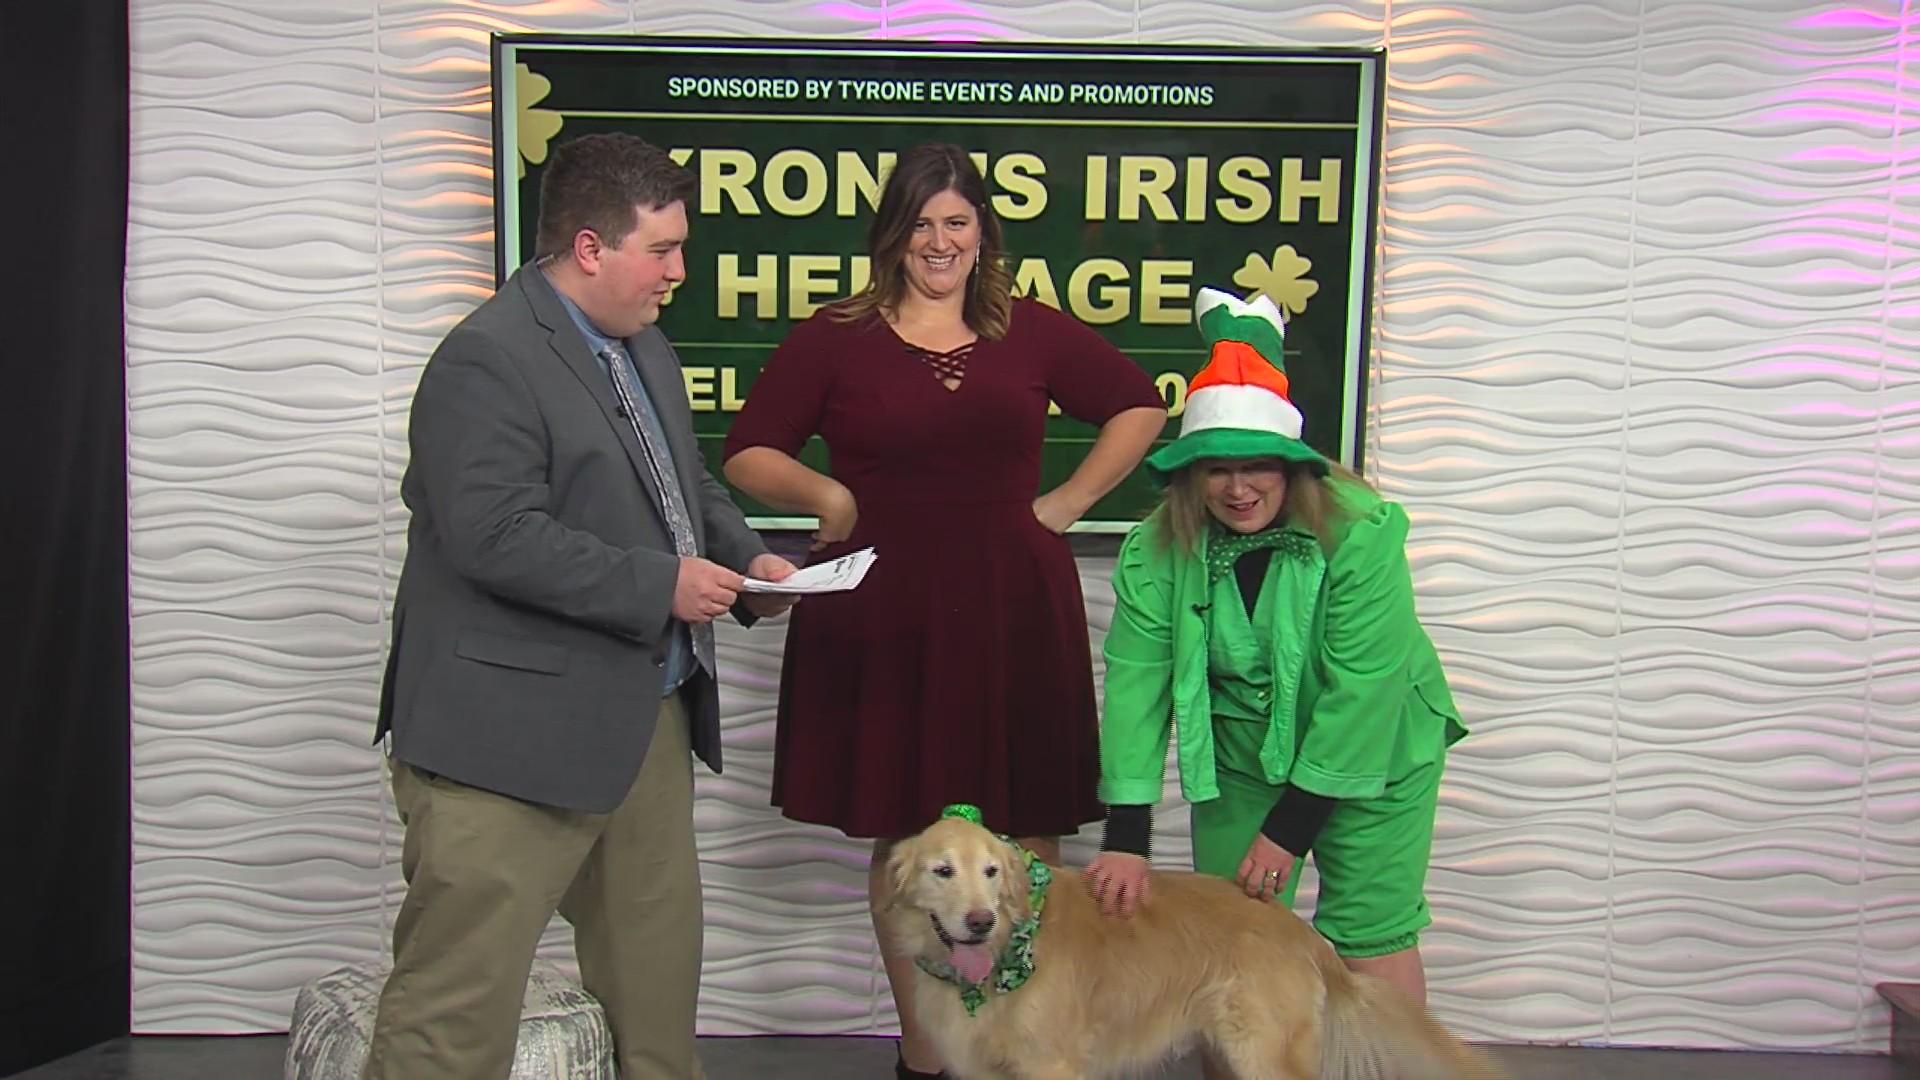 Tyrone Halloween Parade 2020 Feeling Lucky? Tyrone's Irish Heritage Celebration 2020 | WTAJ